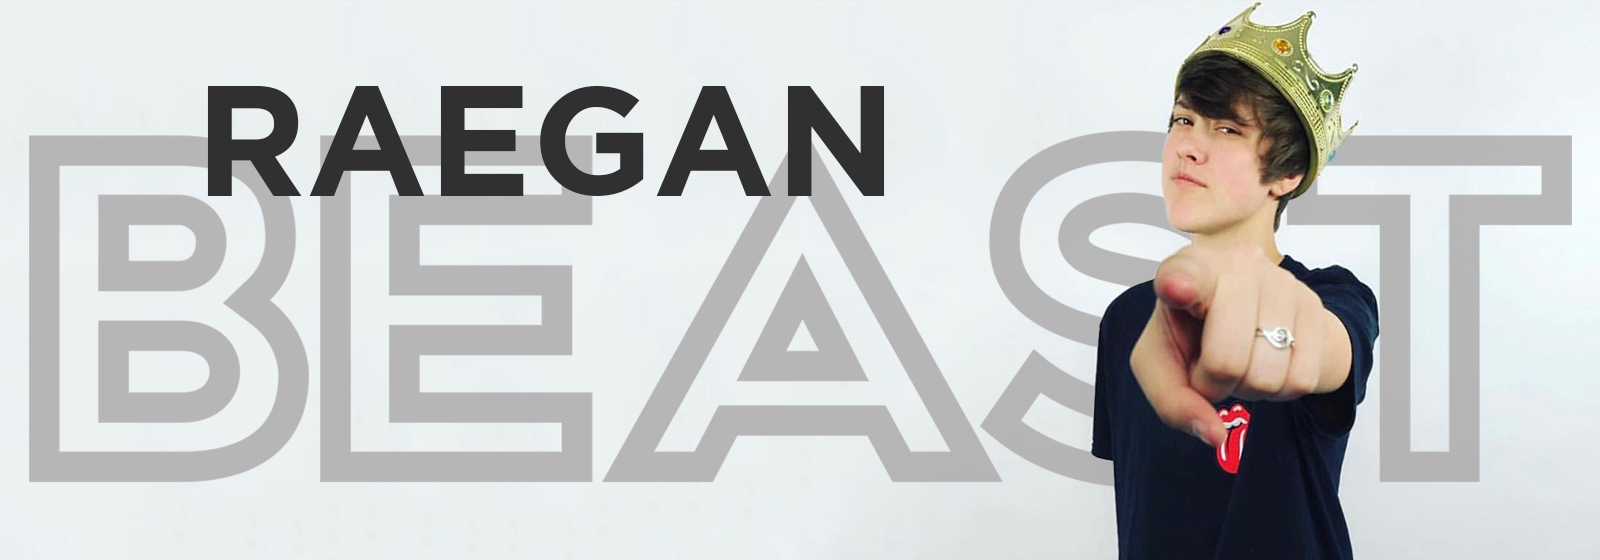 Raegan Beast Official Store Store